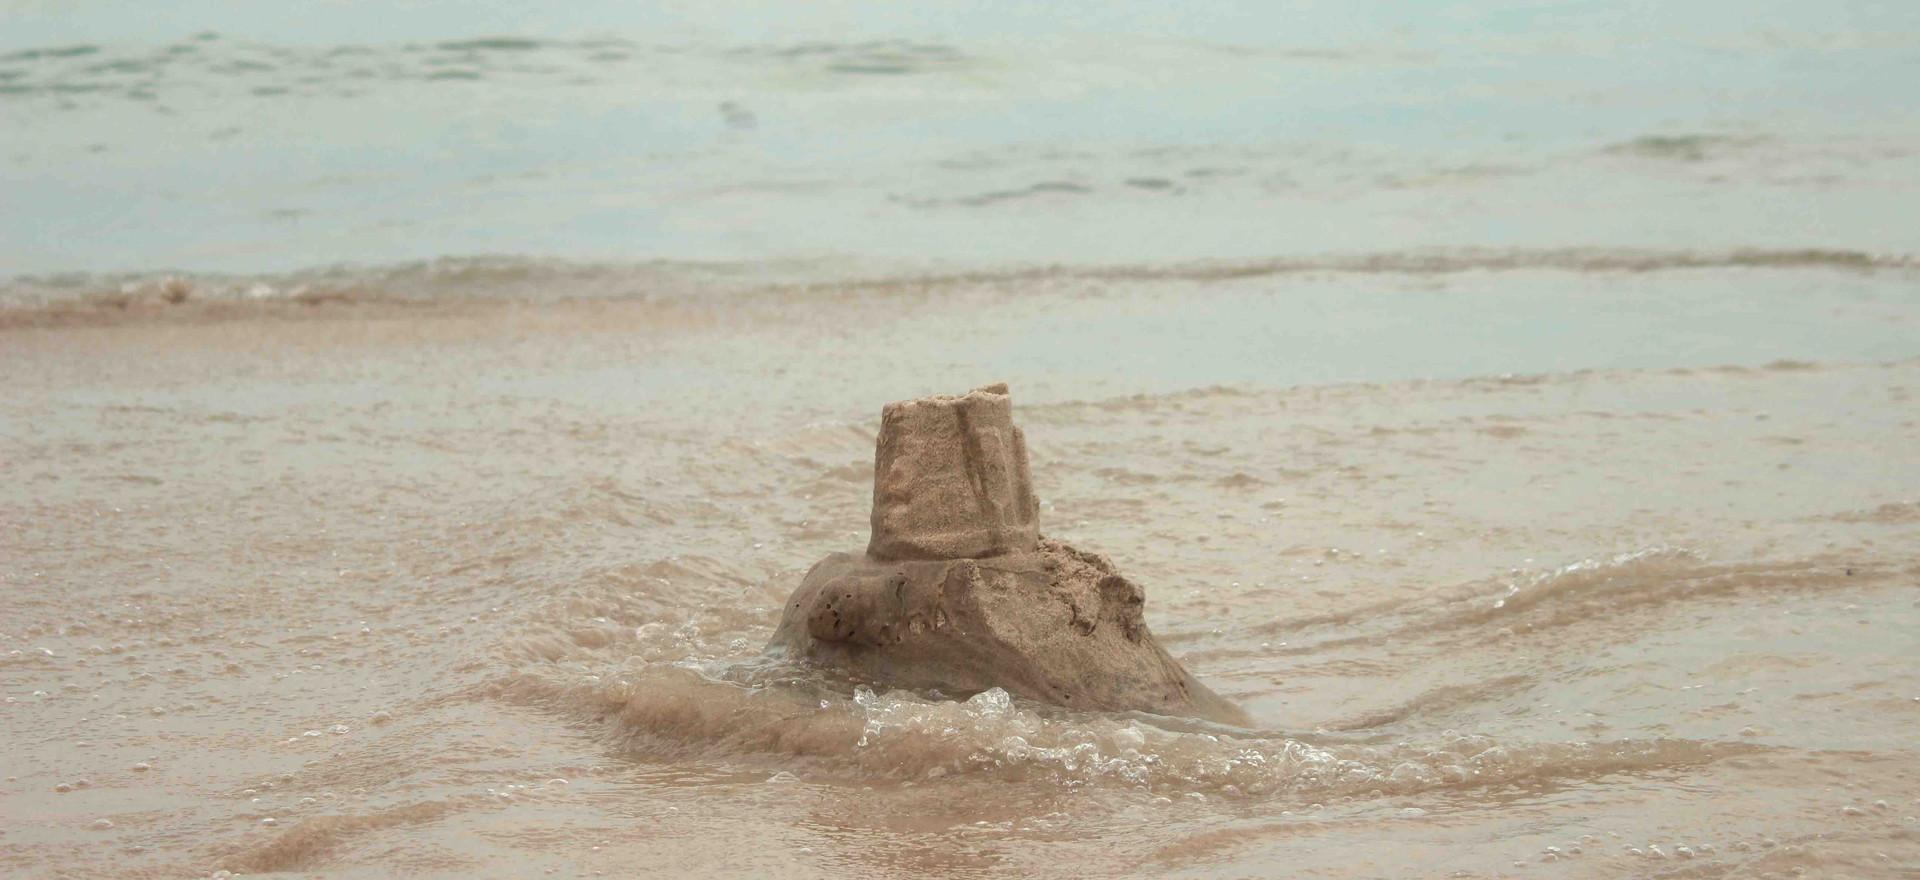 Castelo de água_1